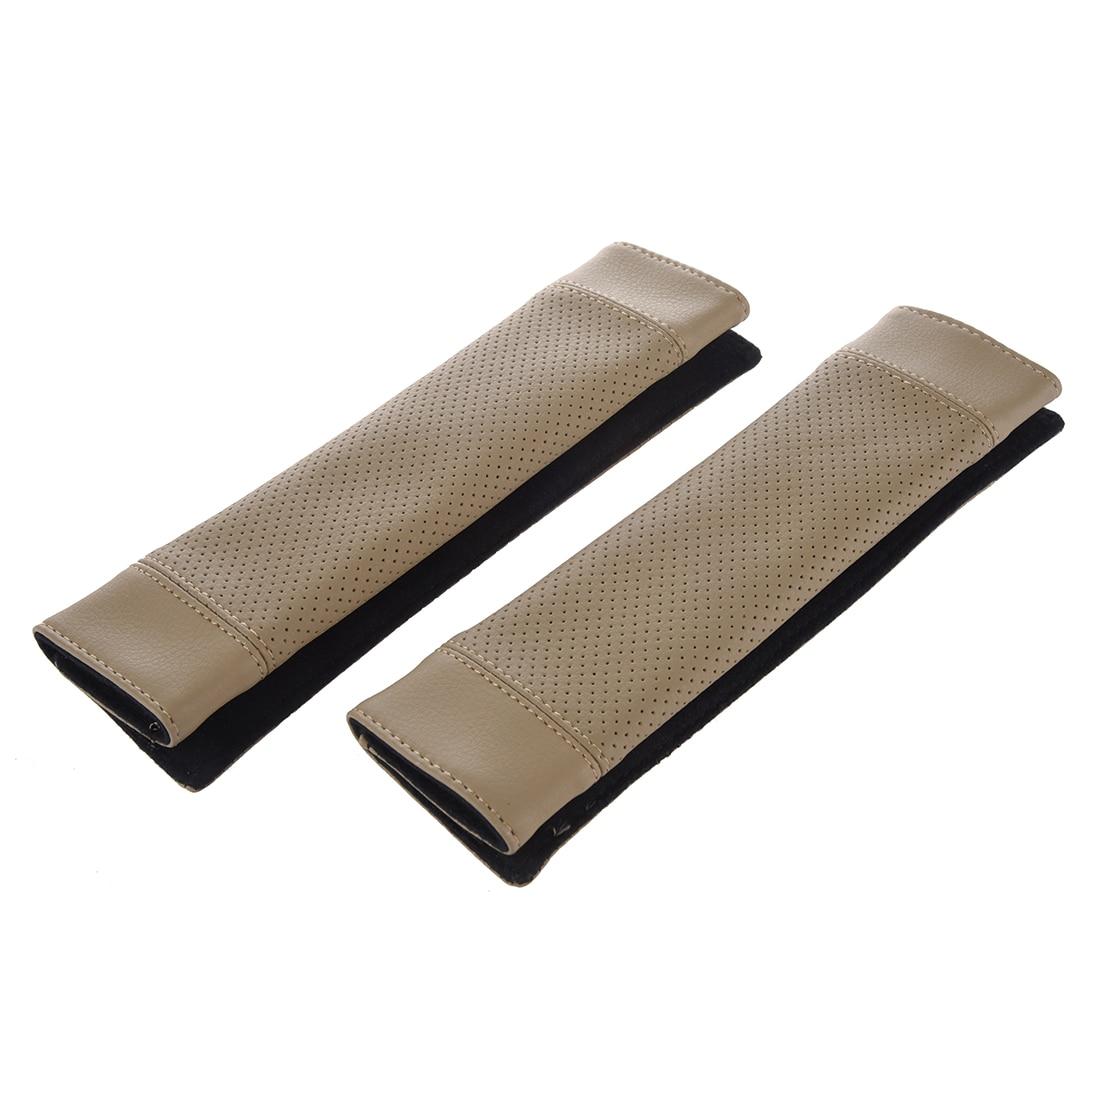 2Pcs PU Leather Car Seat Belt Shoulder pads Cover beige